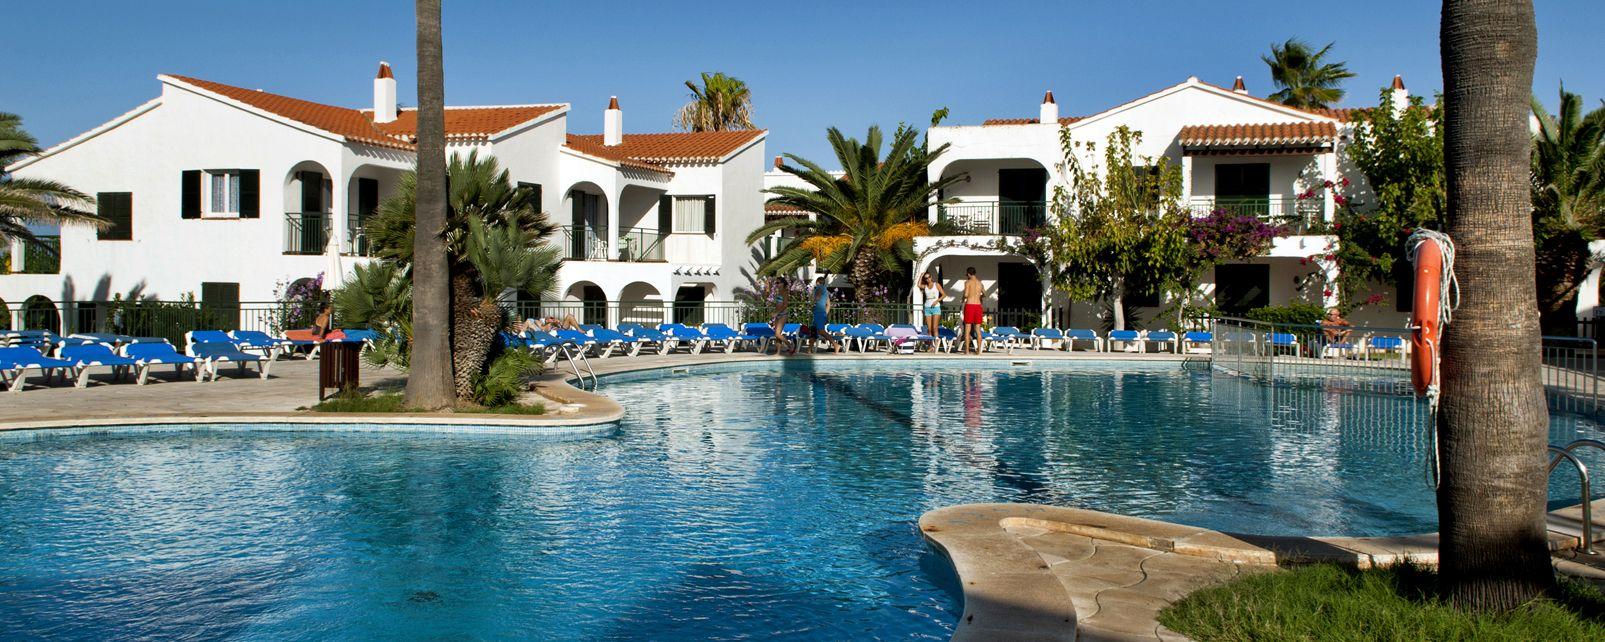 Club Marmara Oasis Menorca